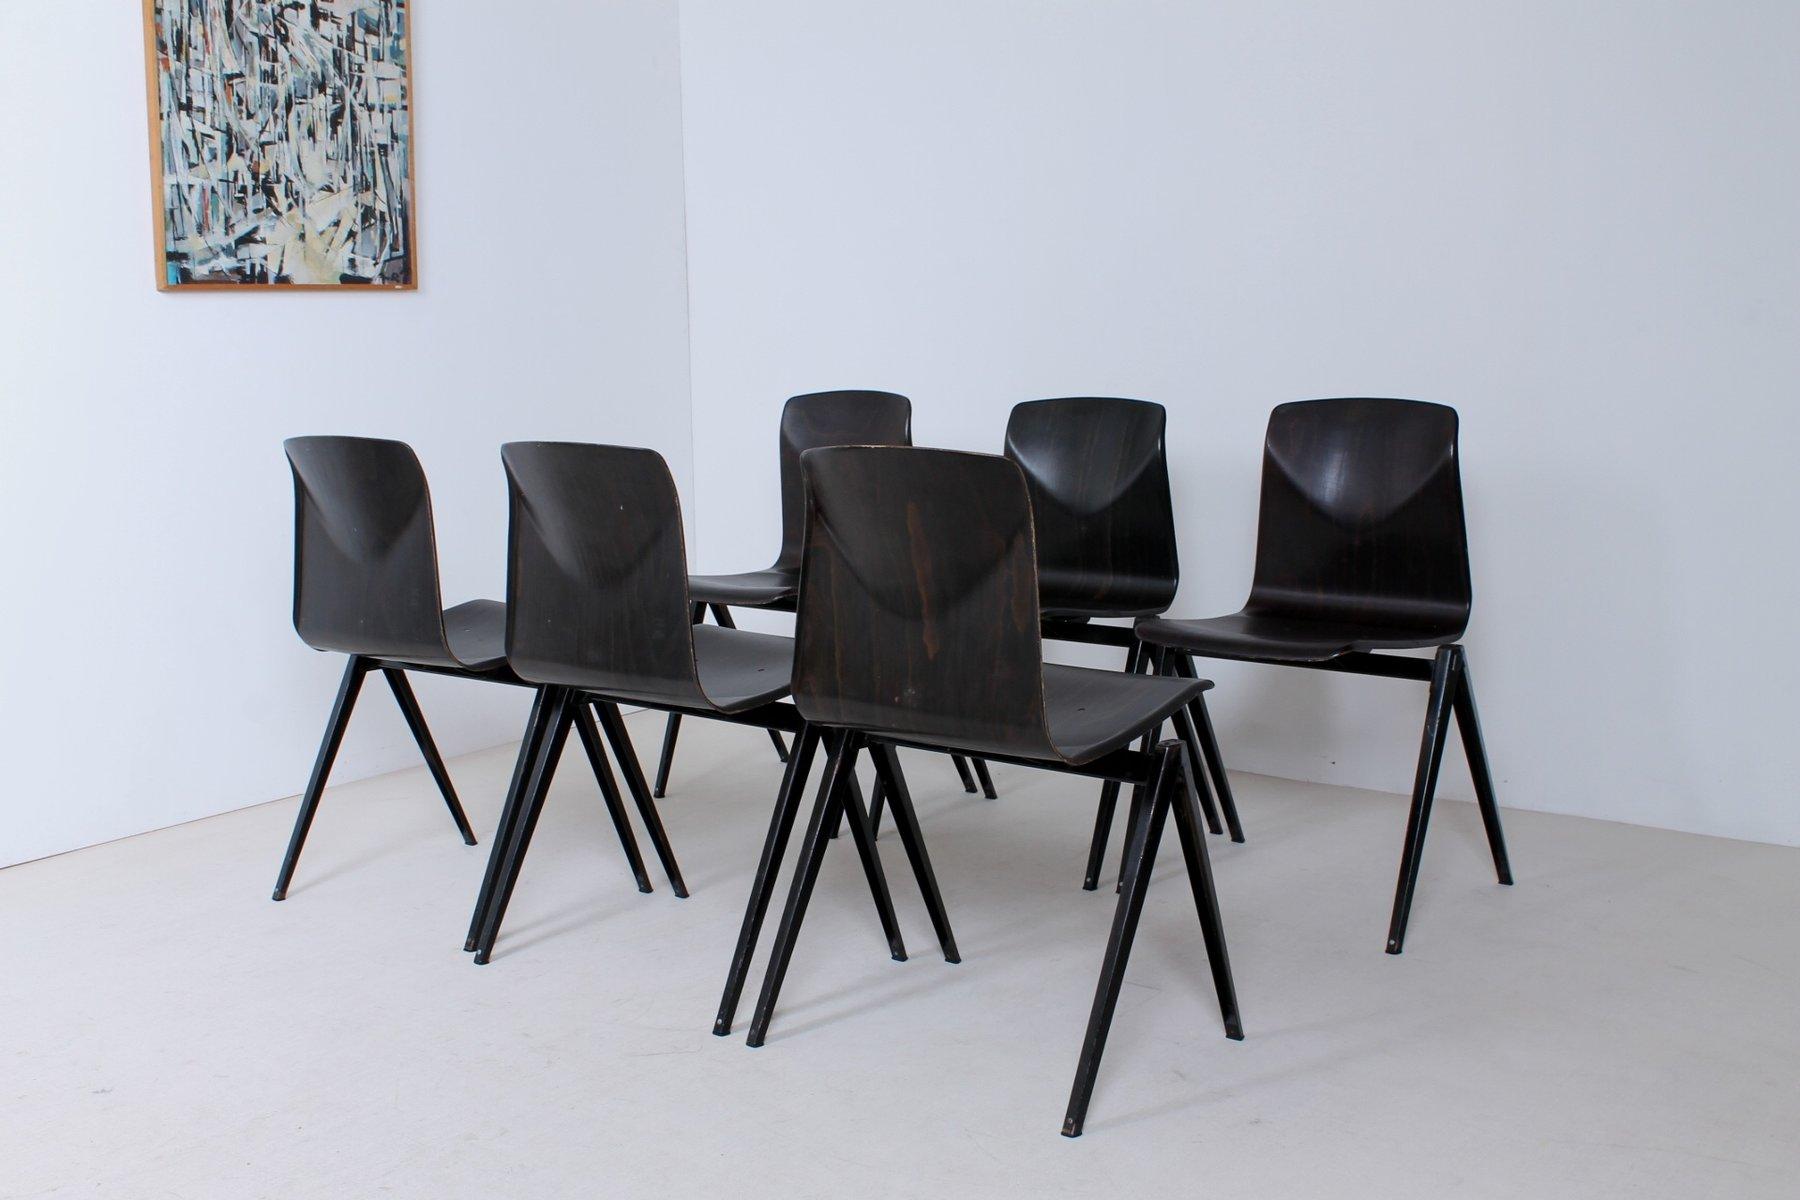 schwarze st hle ziel m belideen. Black Bedroom Furniture Sets. Home Design Ideas